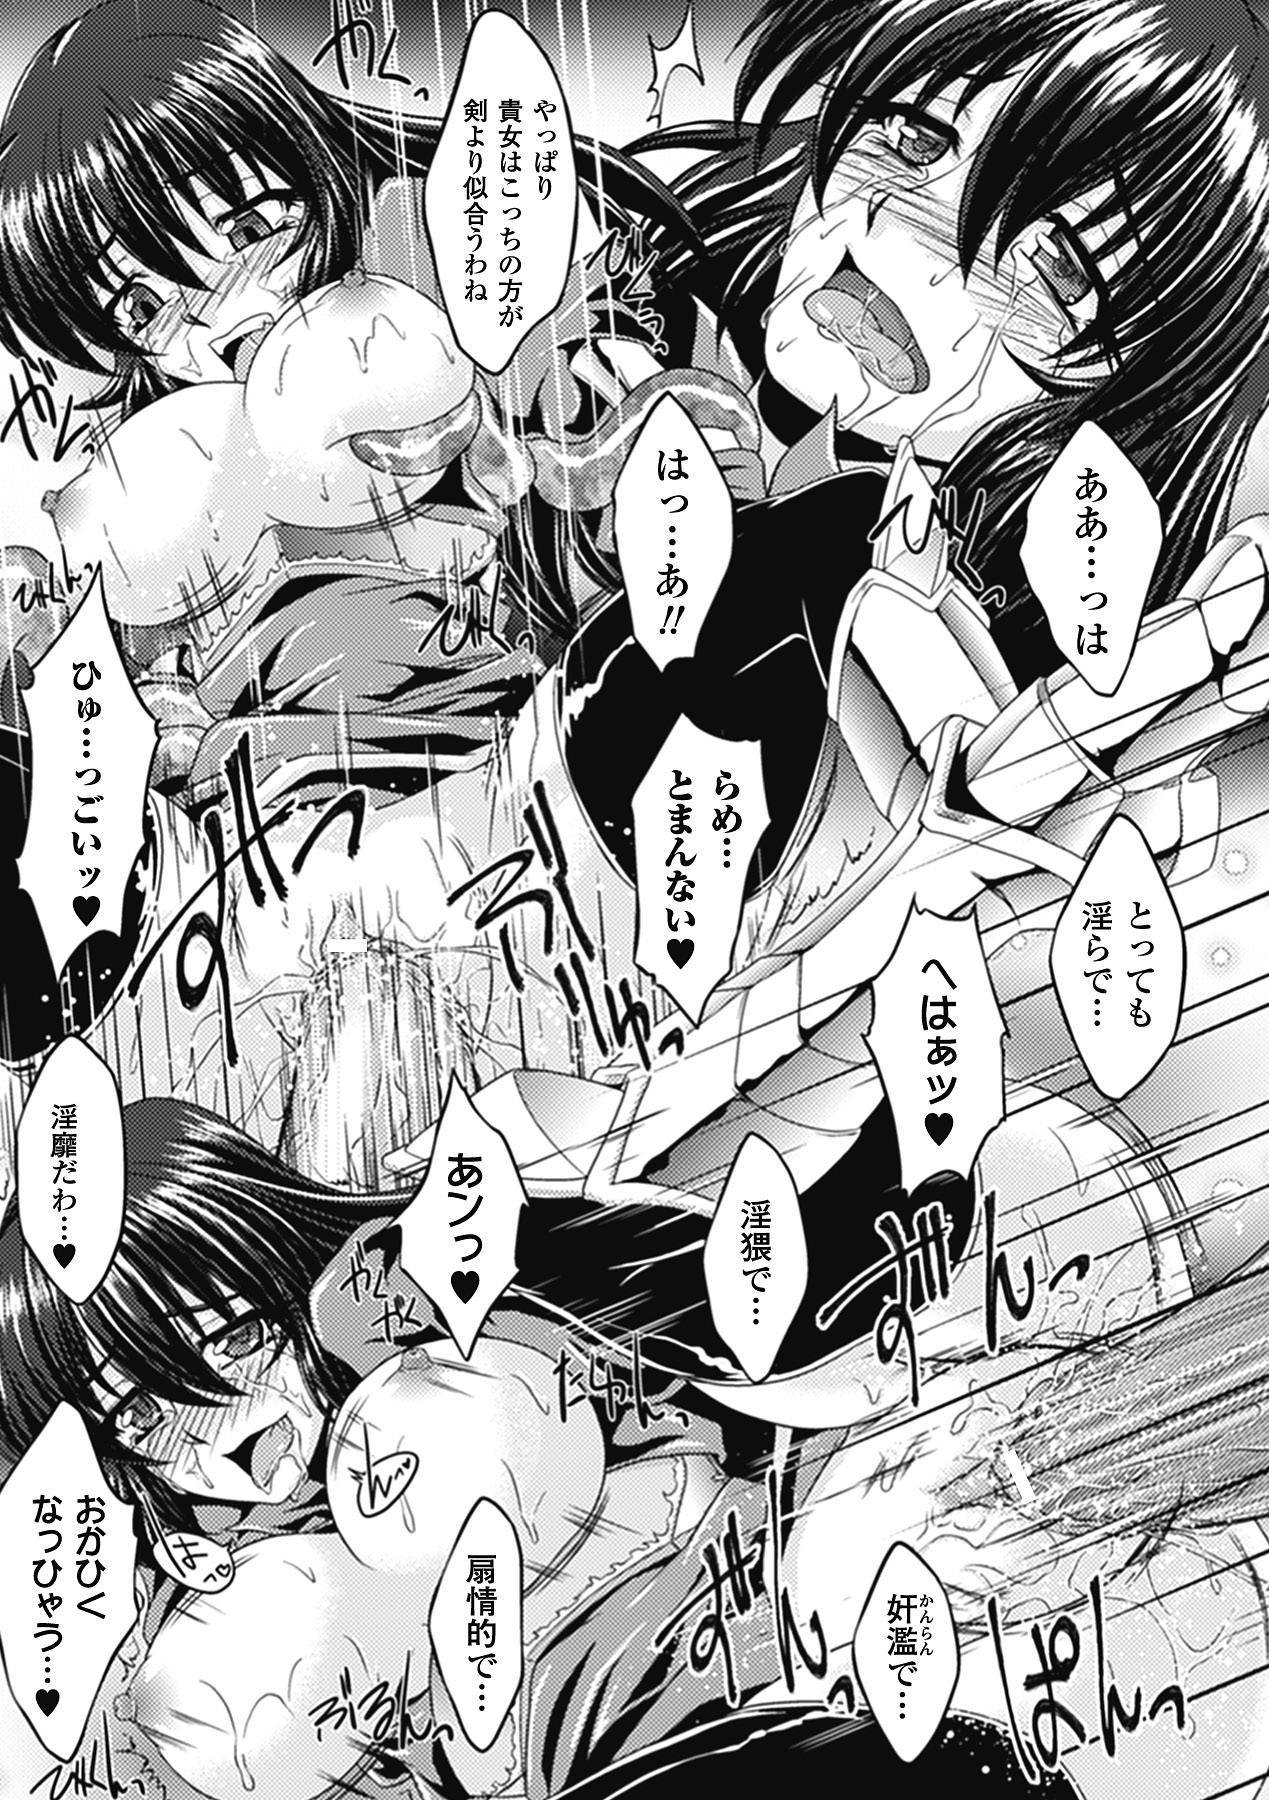 Megami Crisis 1 137